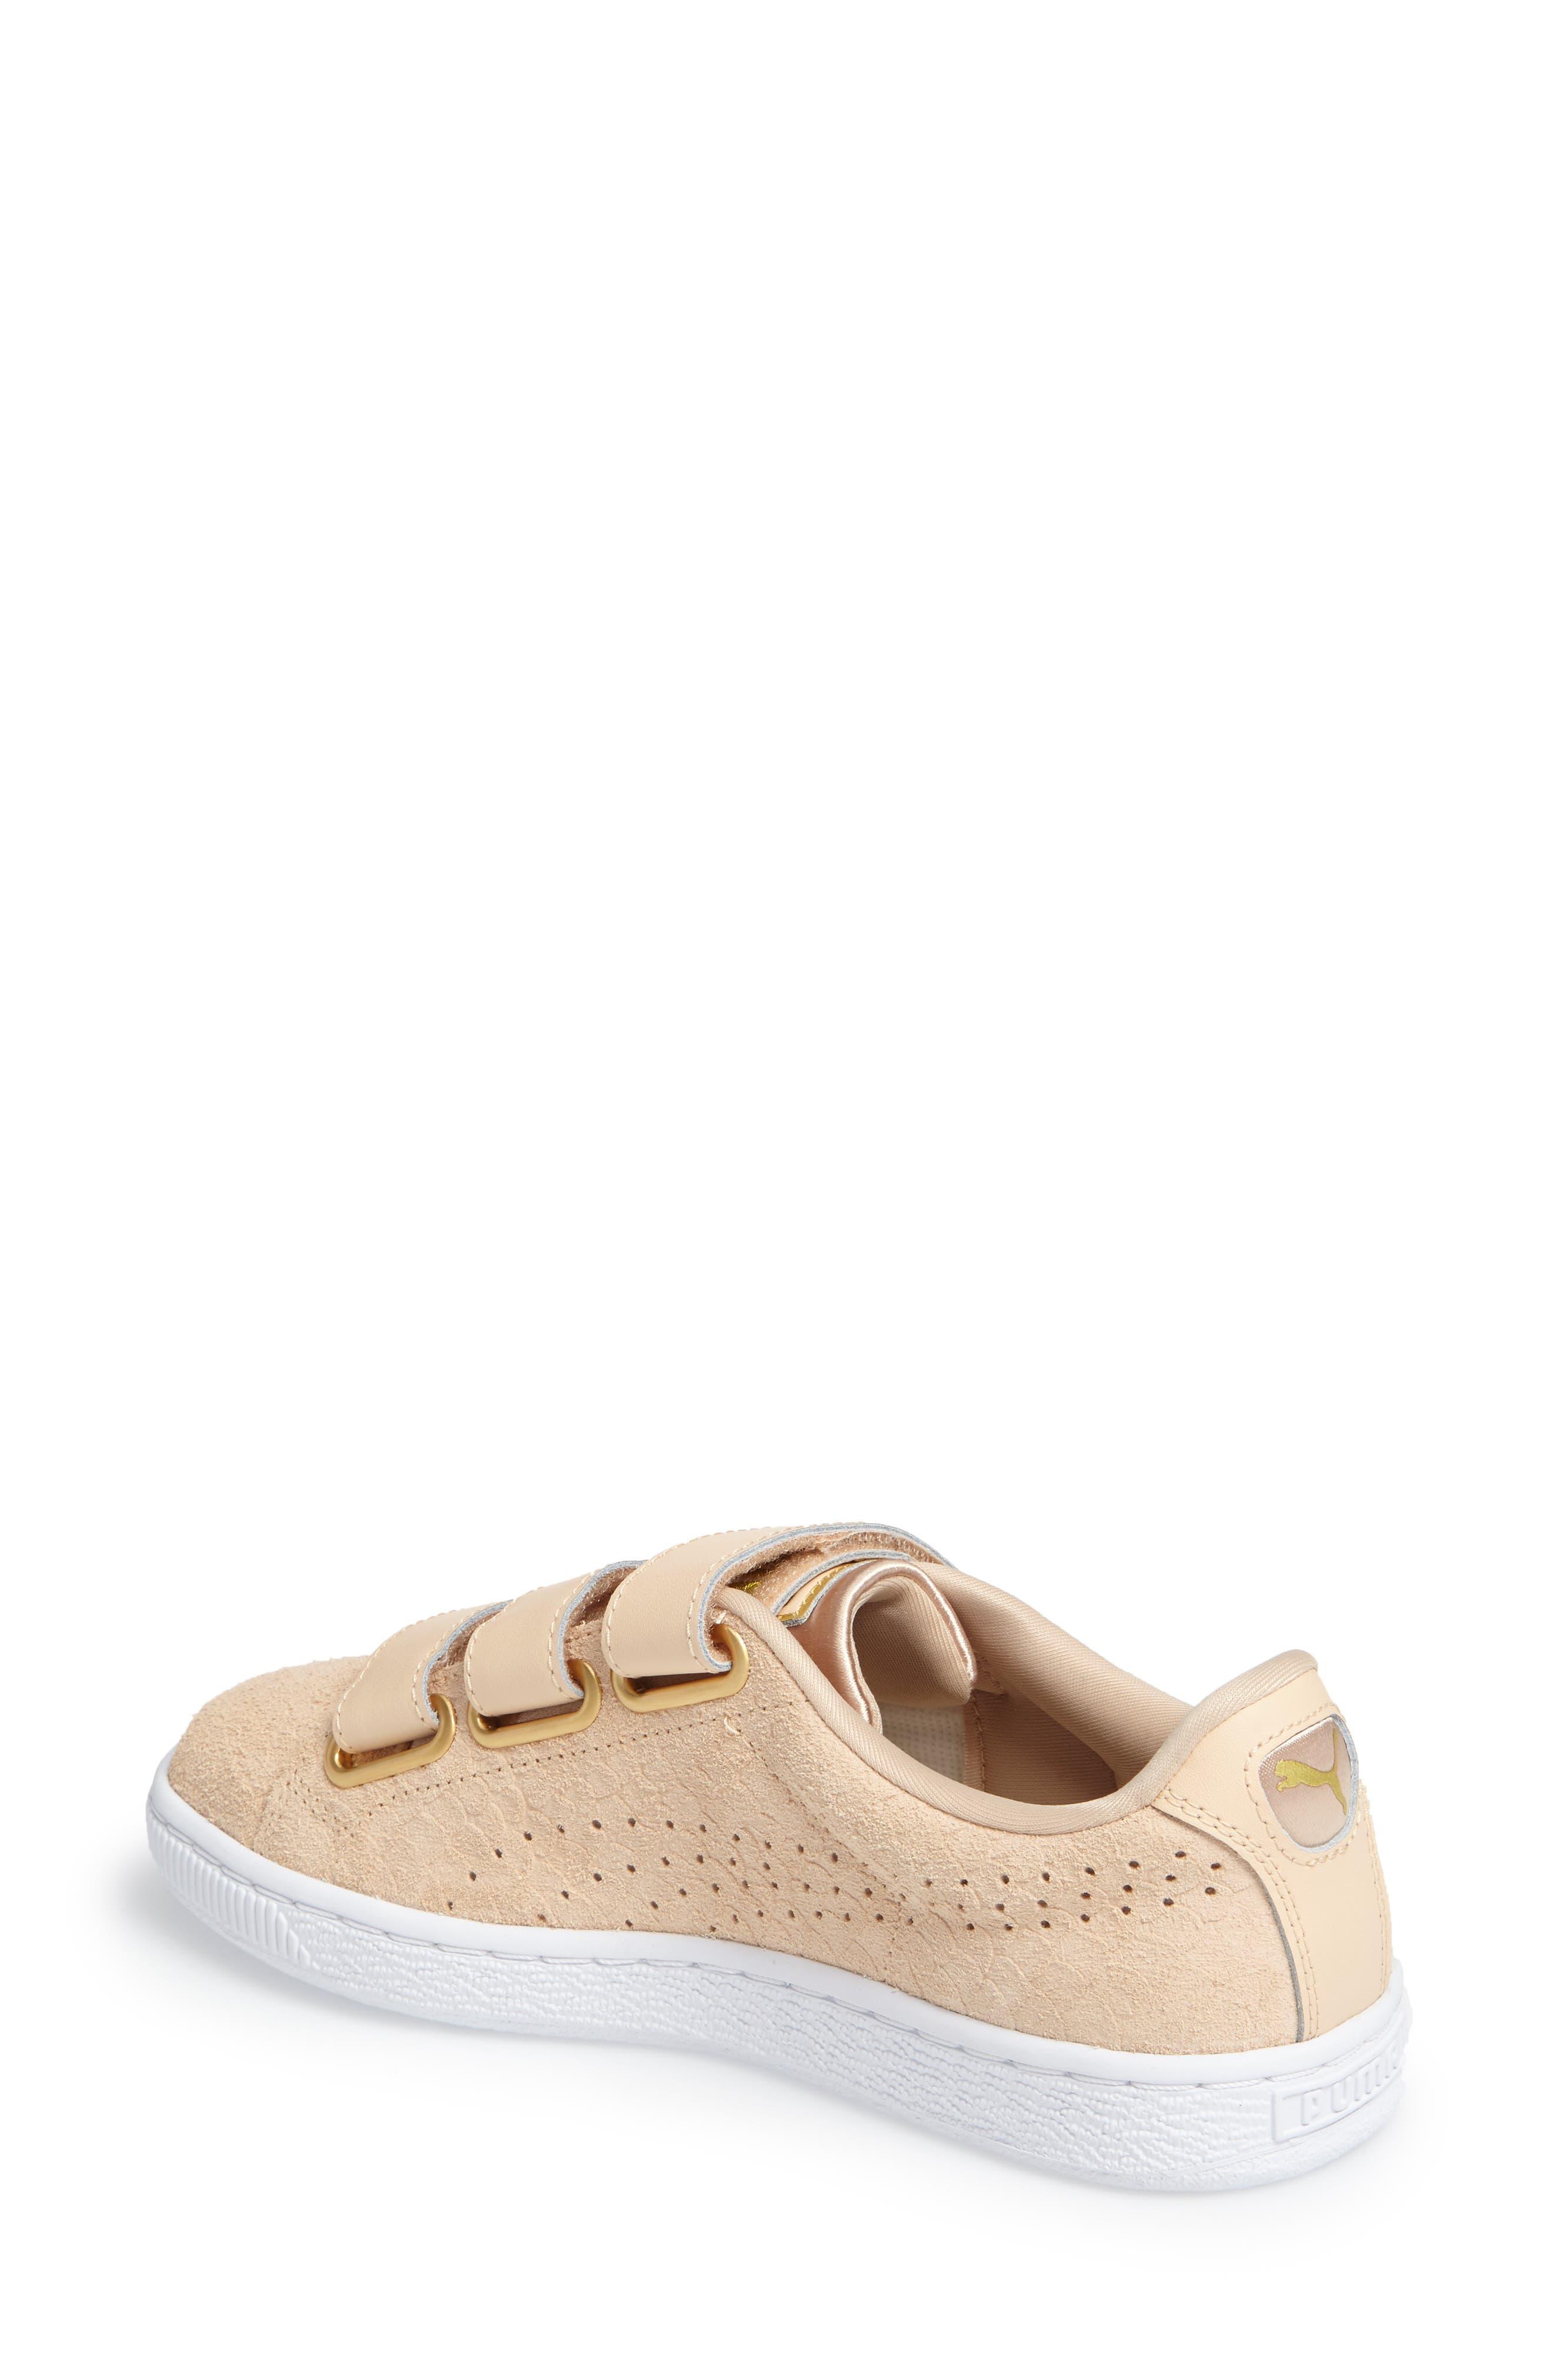 Basket Strap ExoticSkin Sneaker,                             Alternate thumbnail 7, color,